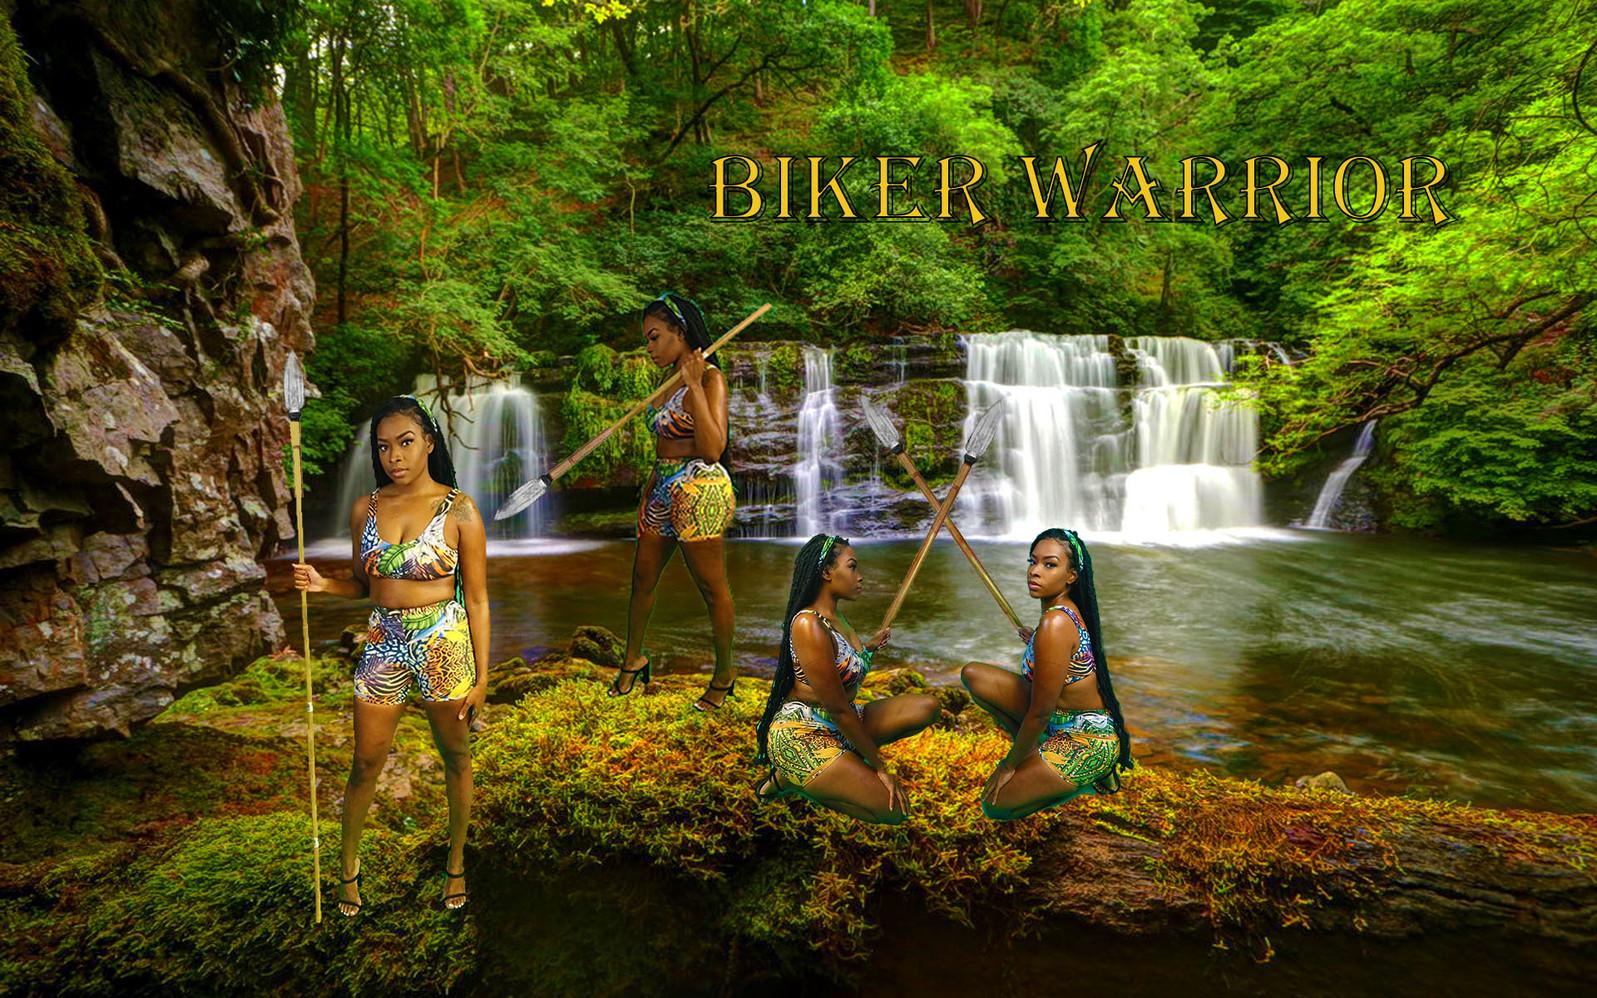 Biker Warrior